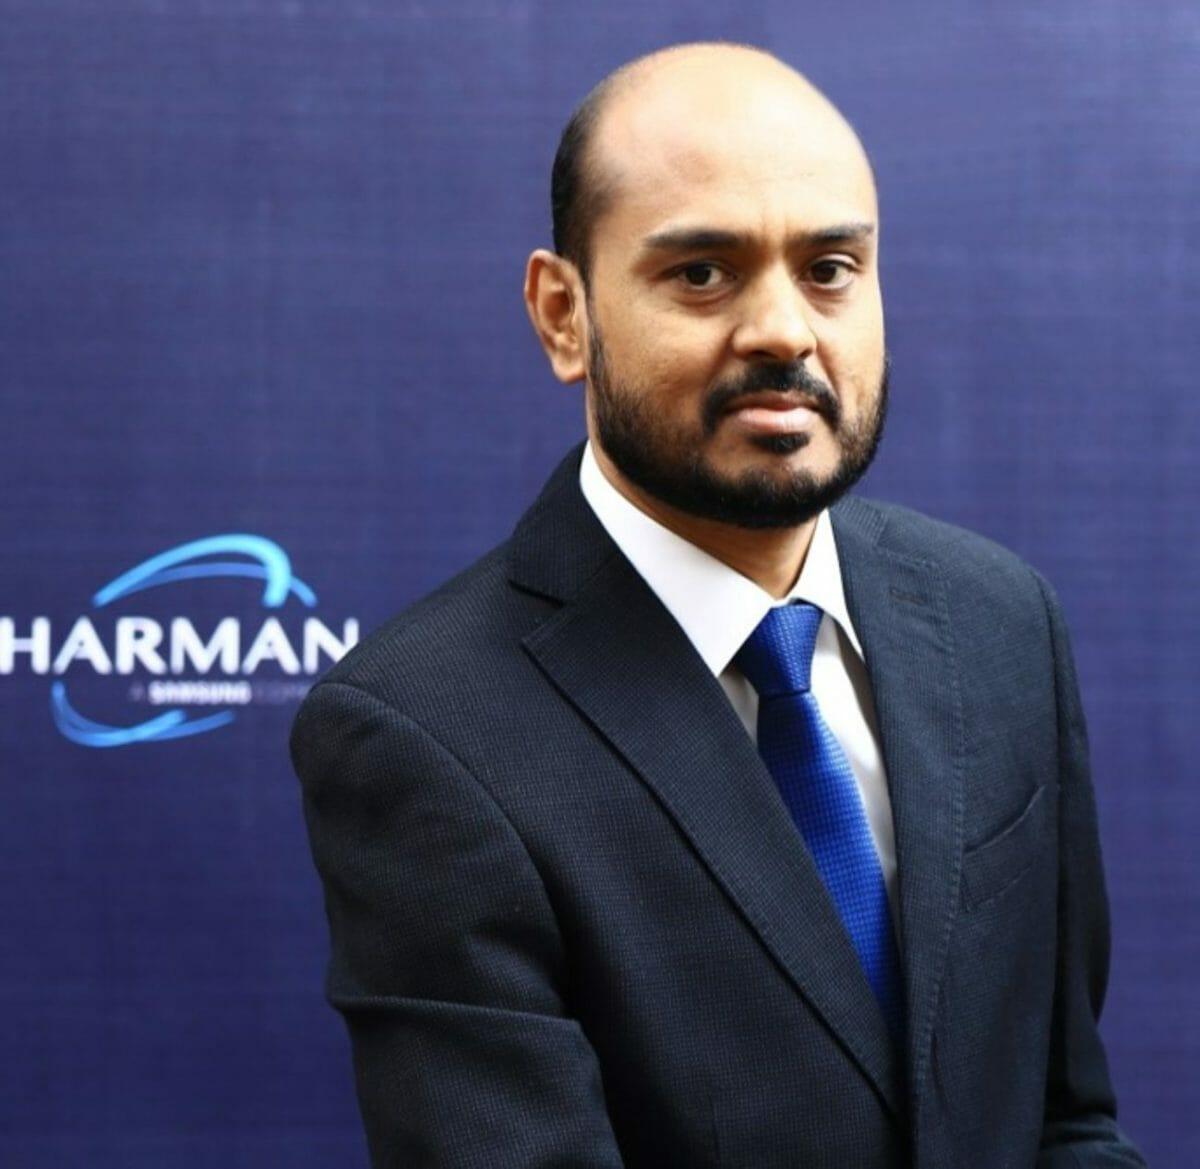 Harman Vice President